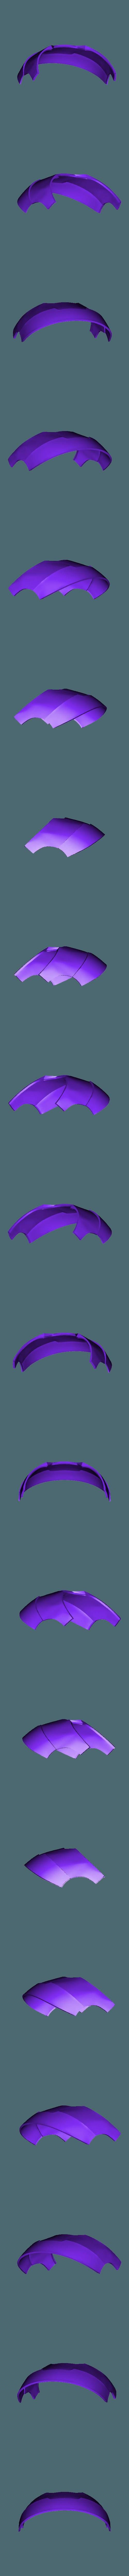 KF_helmet5.stl Download free STL file Iron Man Mark III Helmet Separated and Oriented • 3D printer template, KerseyFabrications